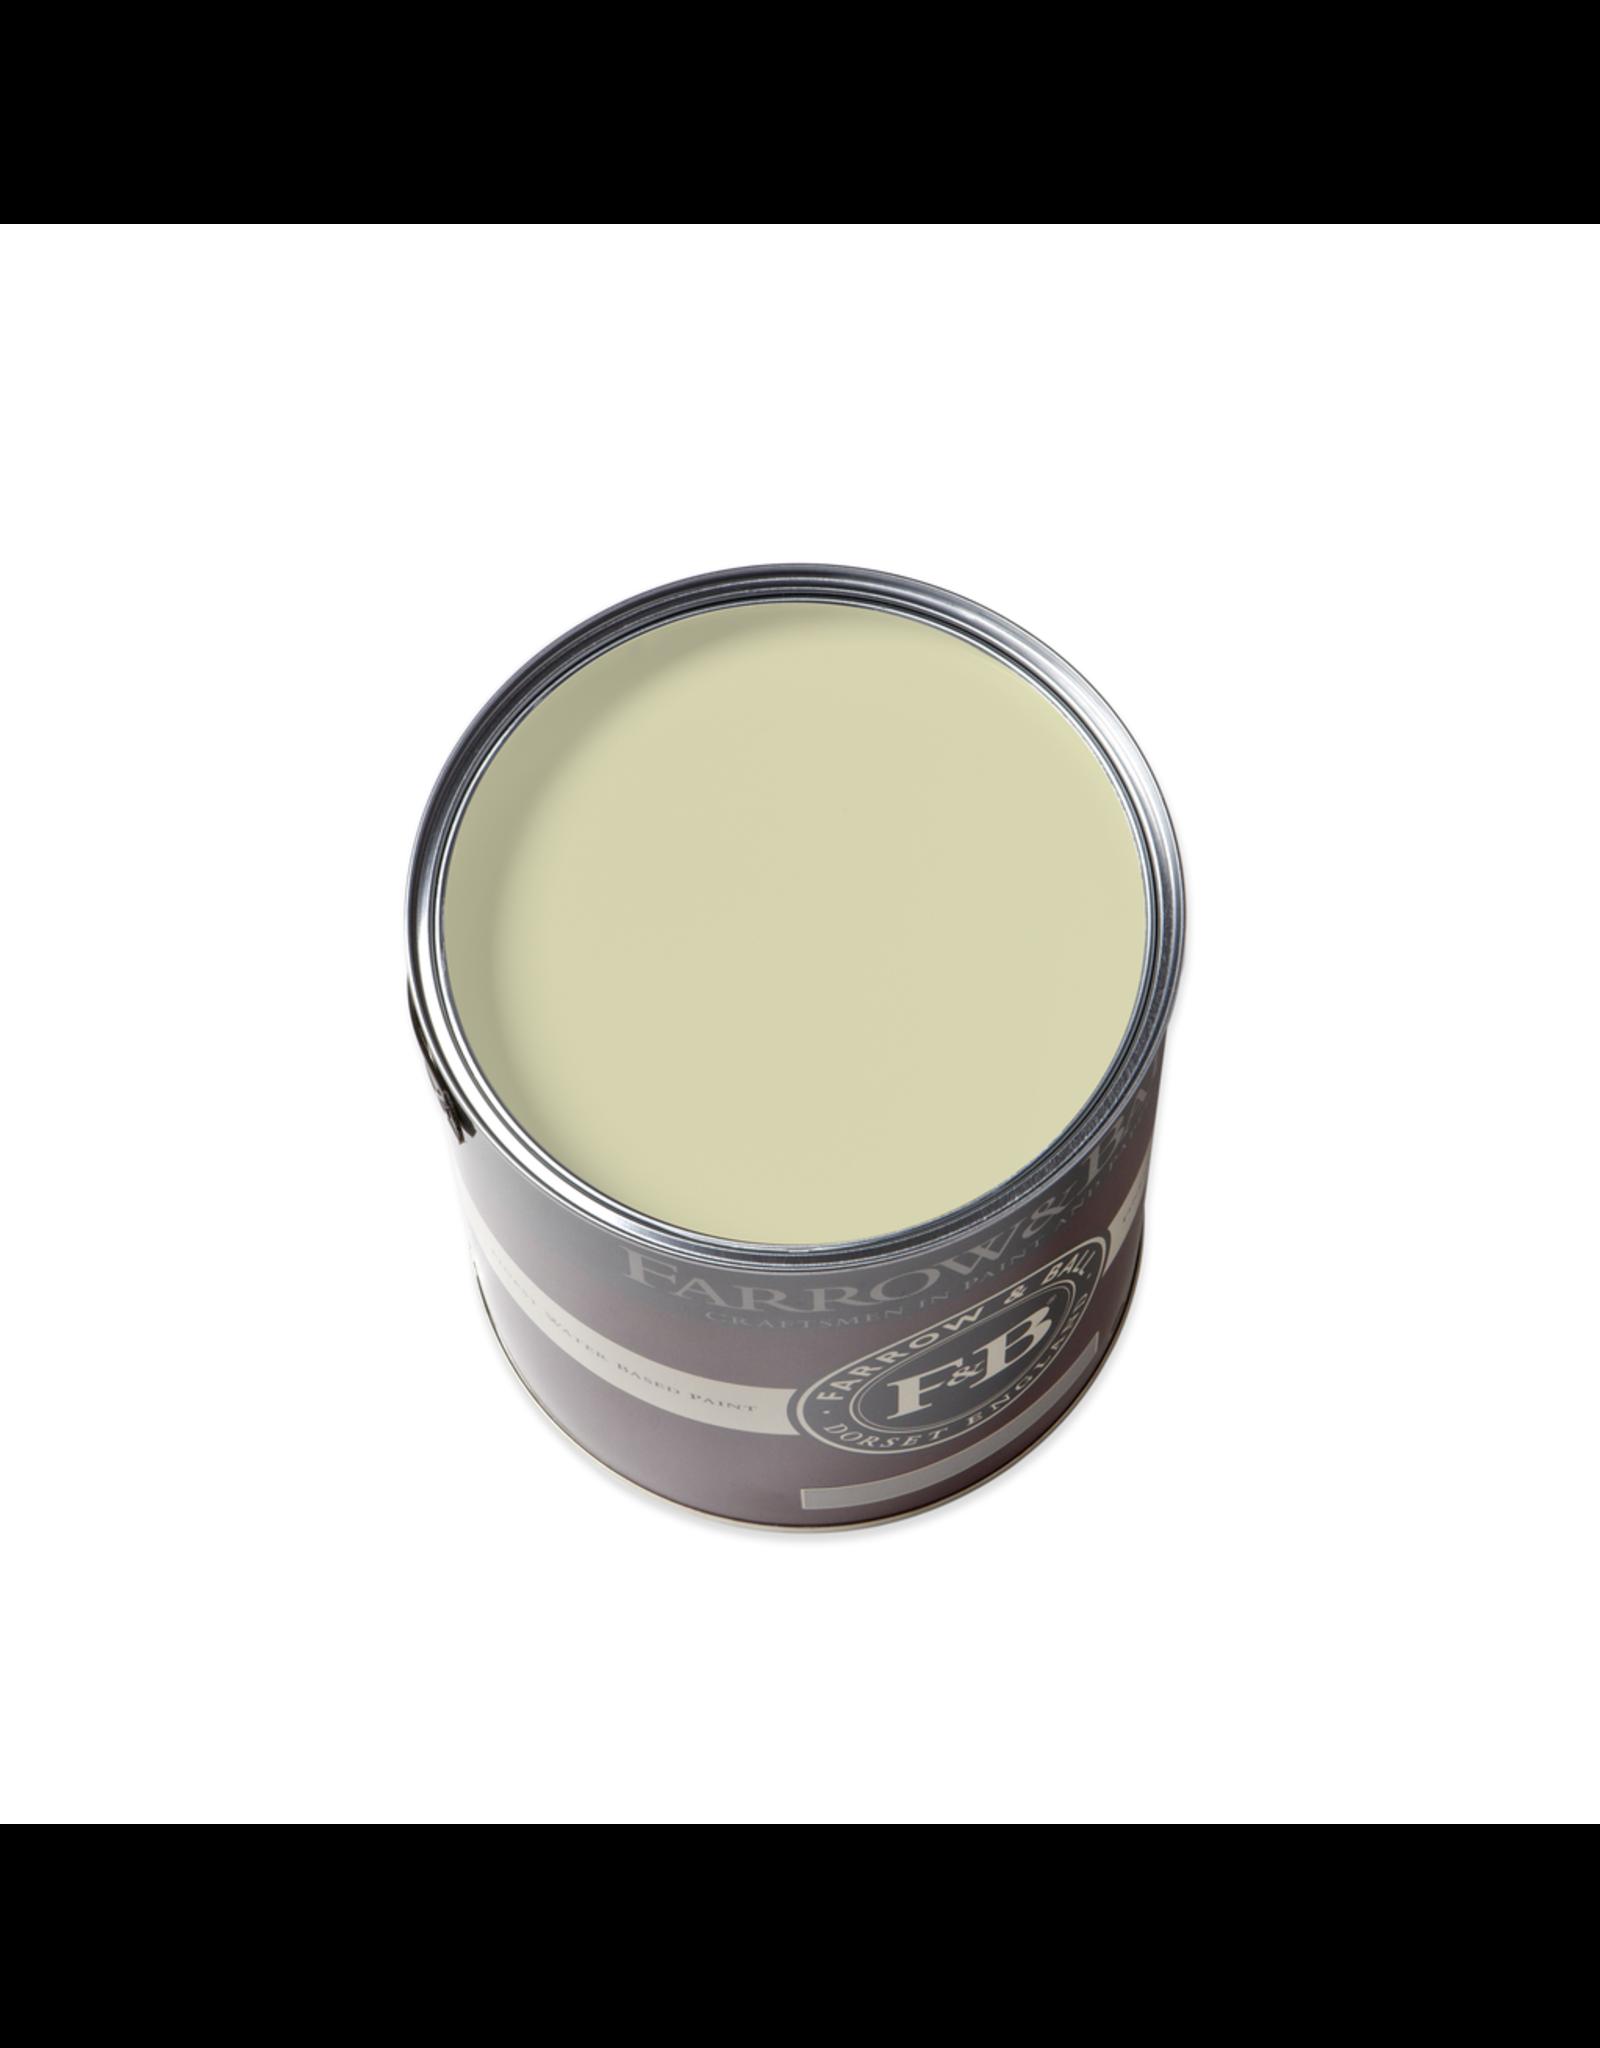 Farrow and Ball Gallon Modern Emulsion Green Ground No. 206